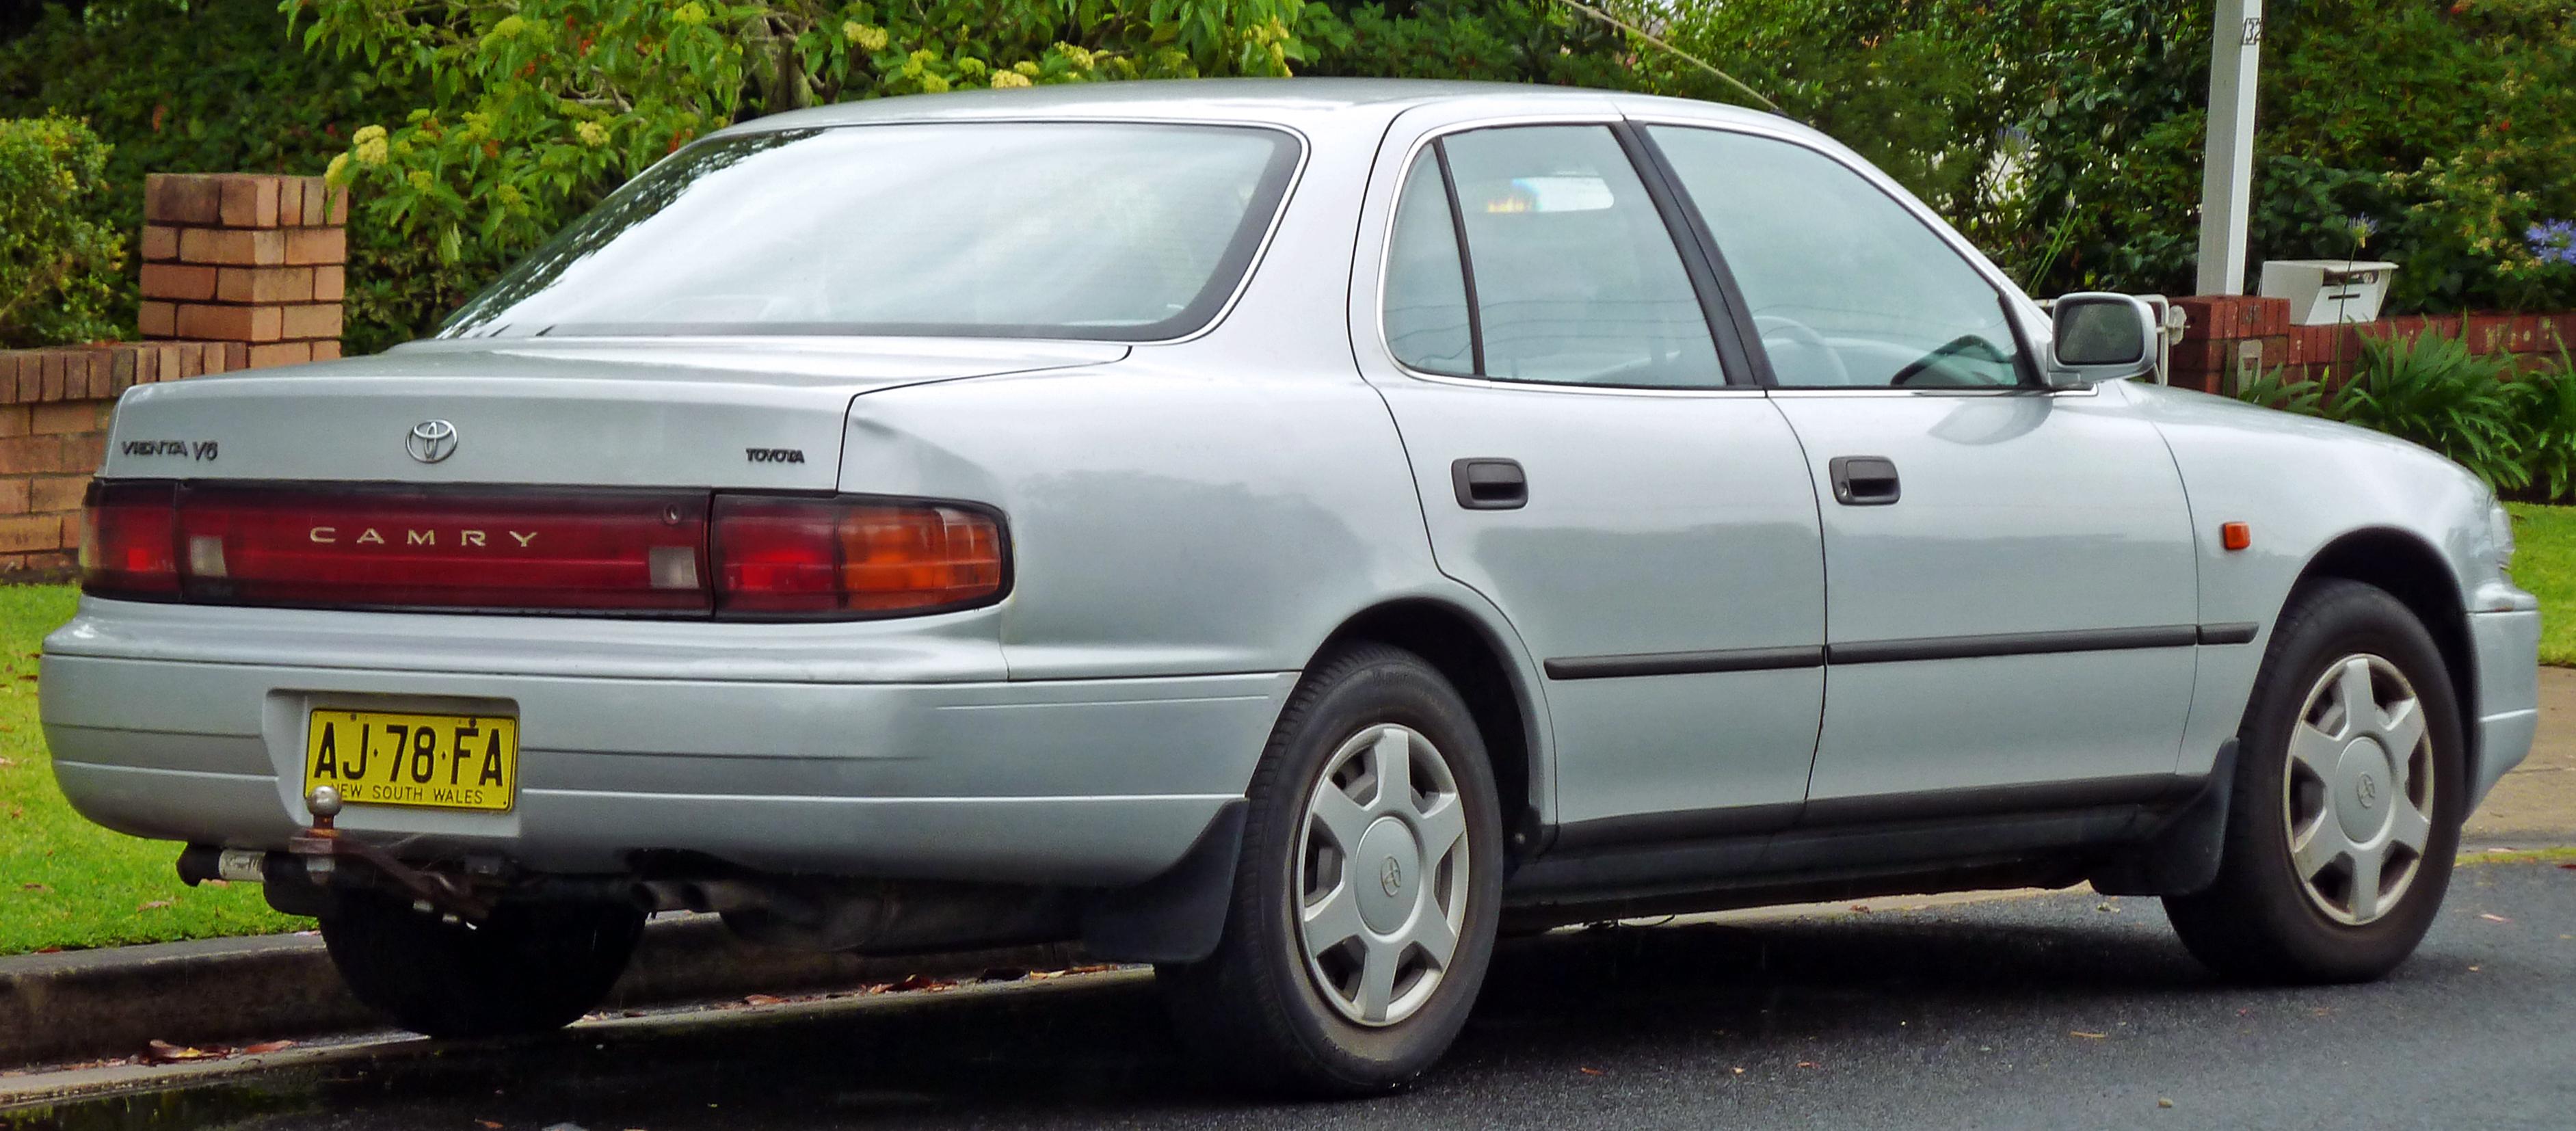 1994 Toyota Camry Image 6